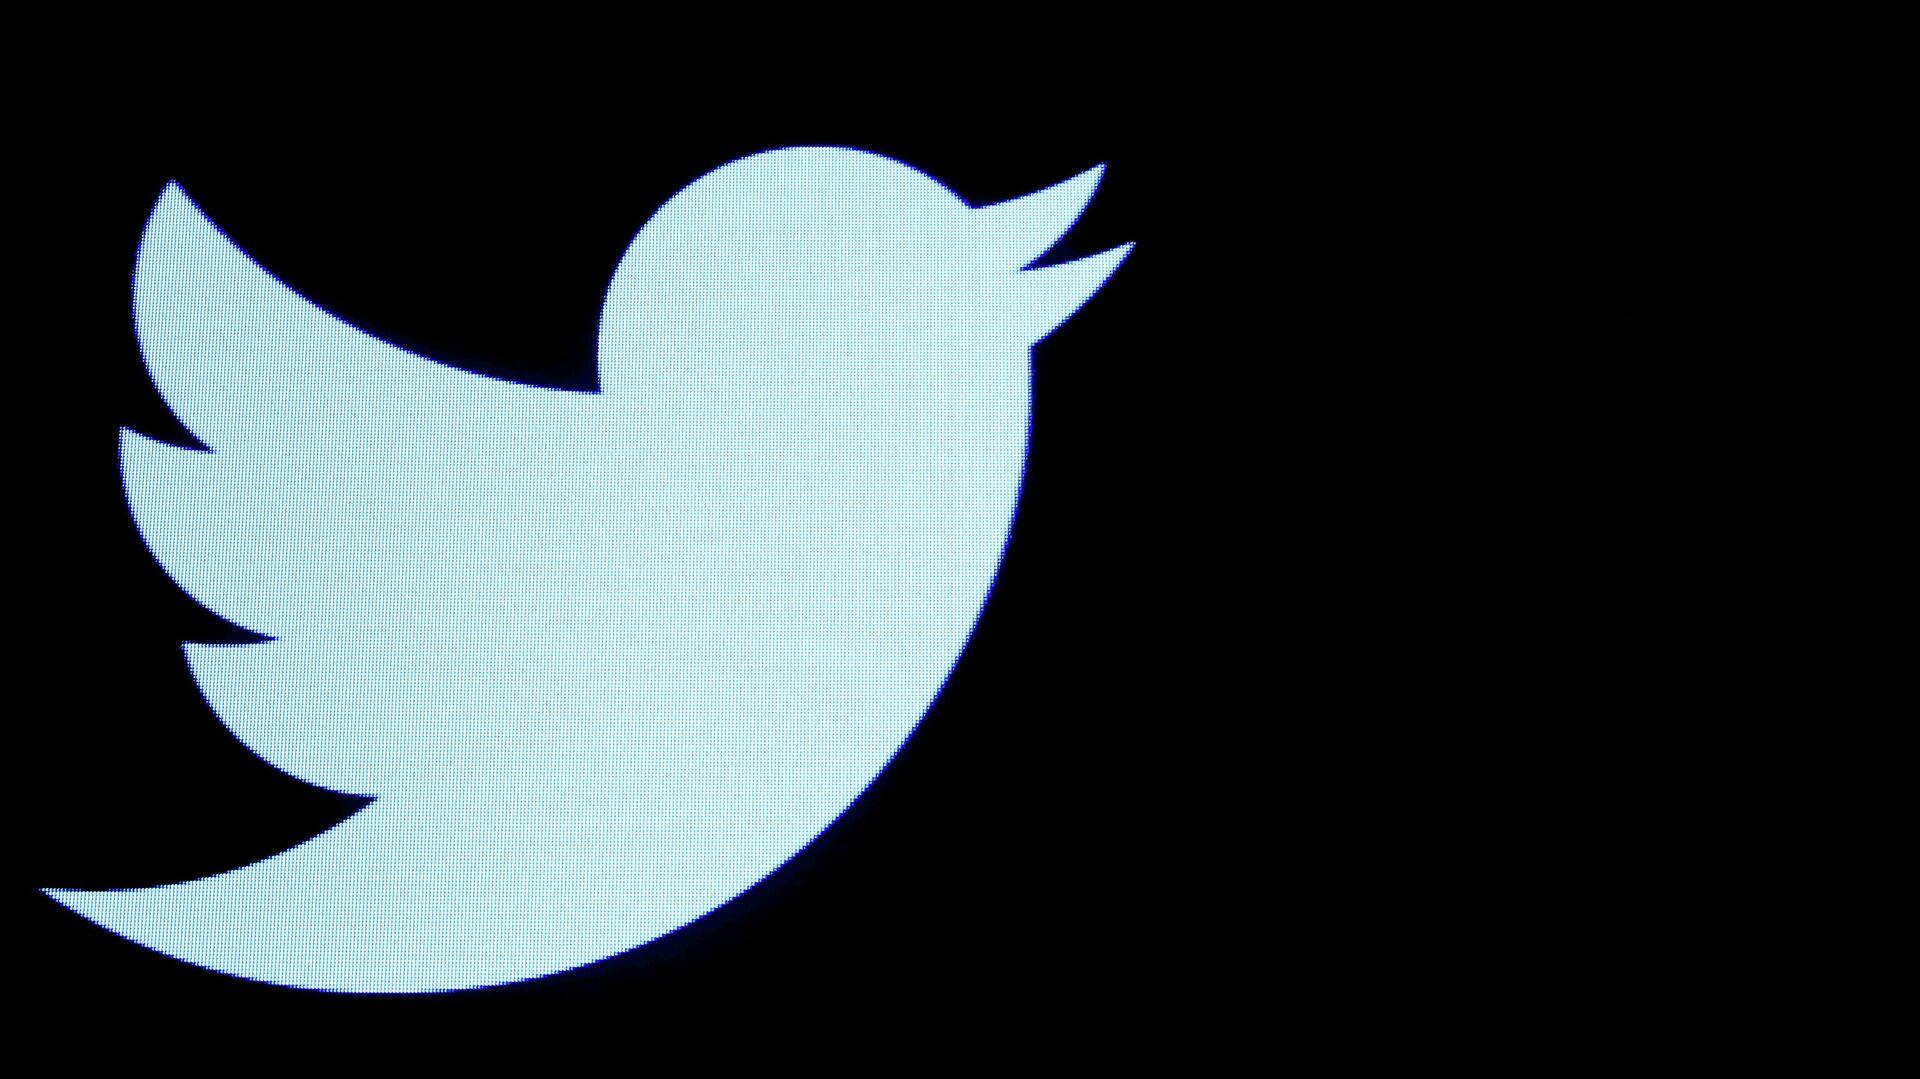 Twitter-Logo (Symbolbild) - SNA, 1920, 31.05.2021